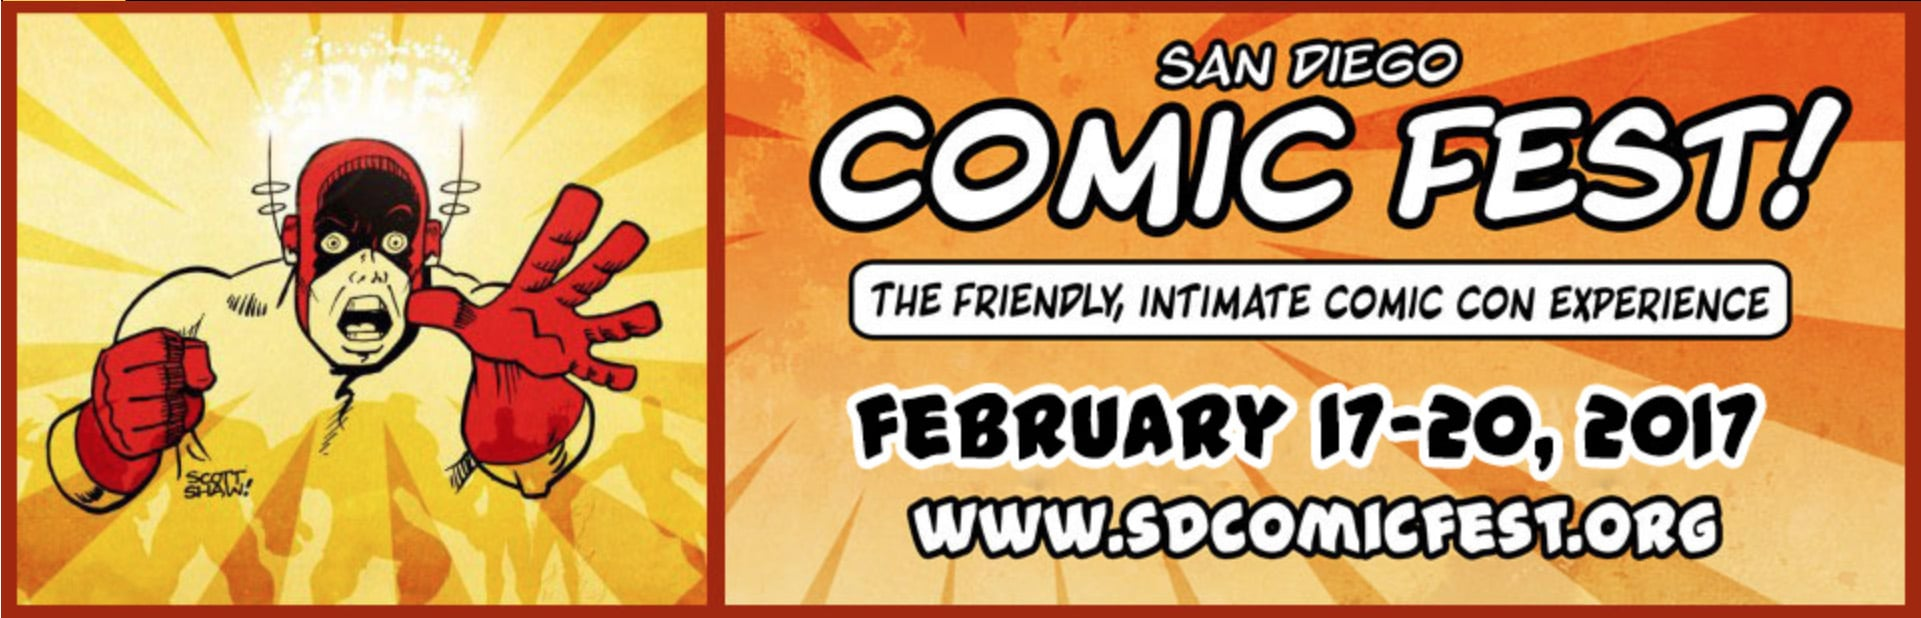 SD ComicFest 2017